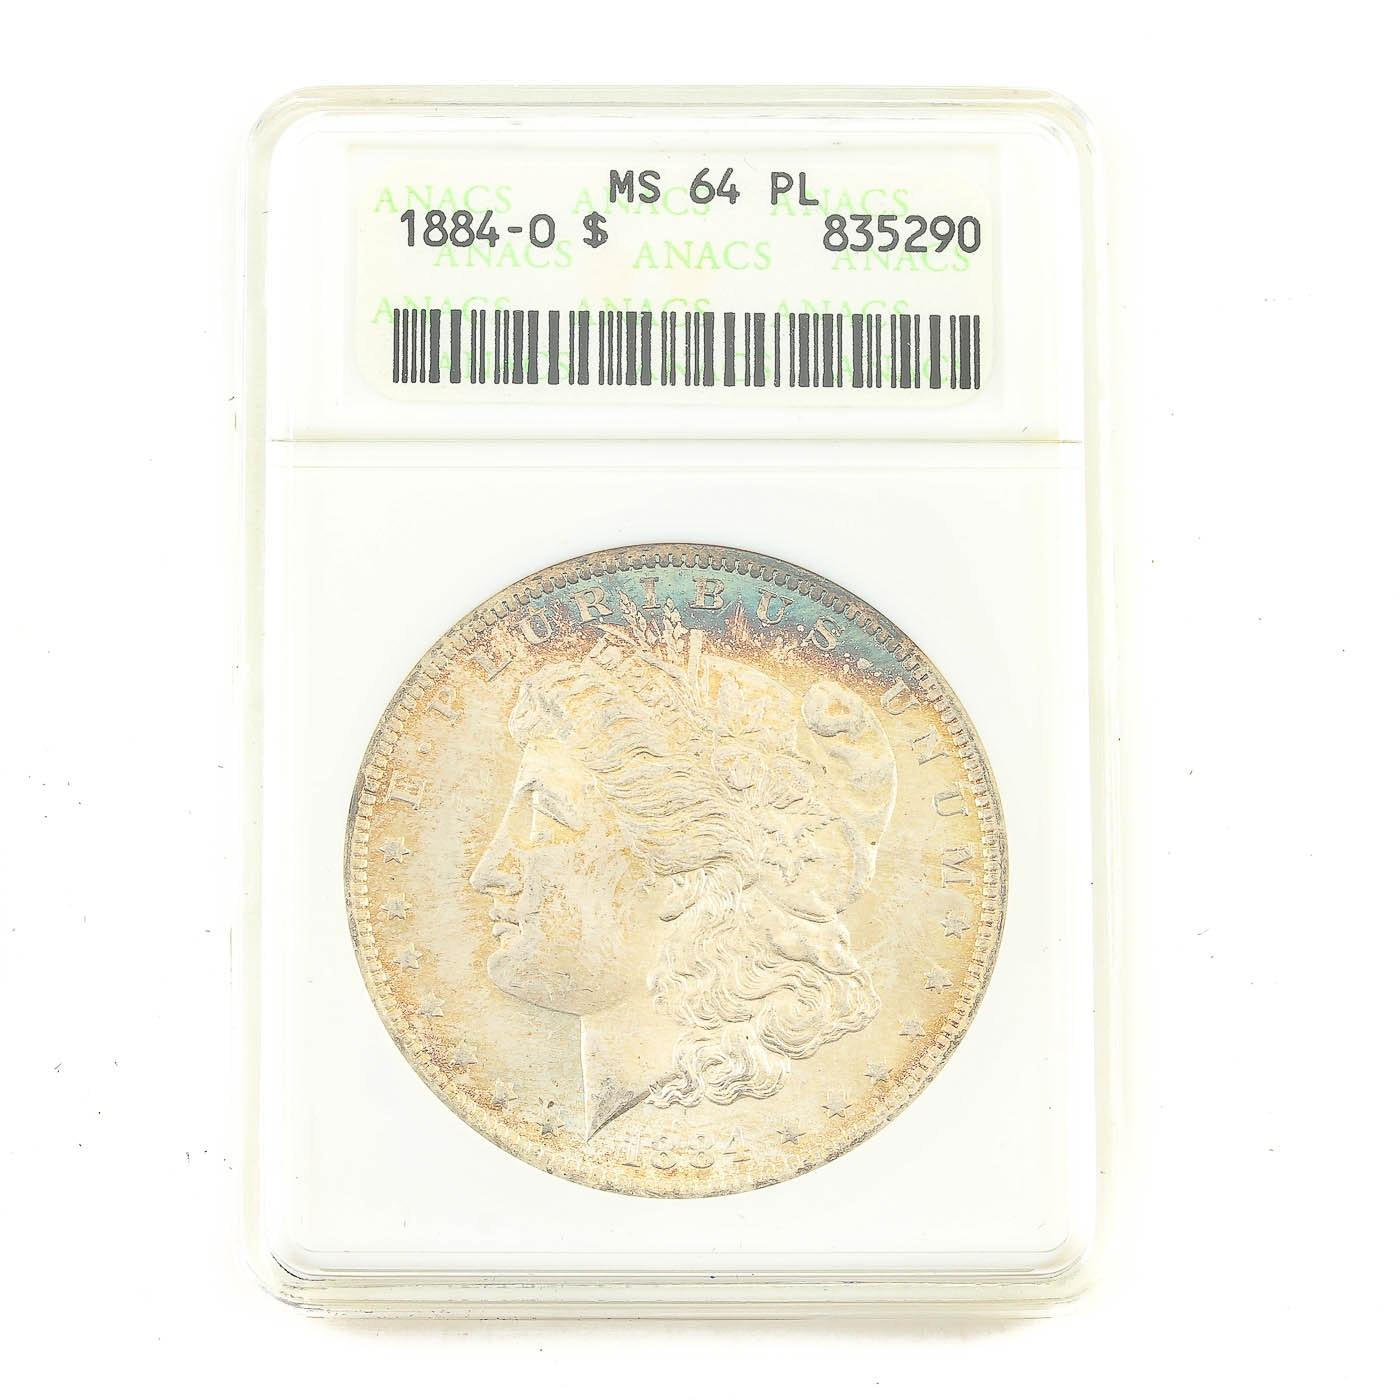 ANACS graded MS64 PL 1884-O Morgan Silver Dollar